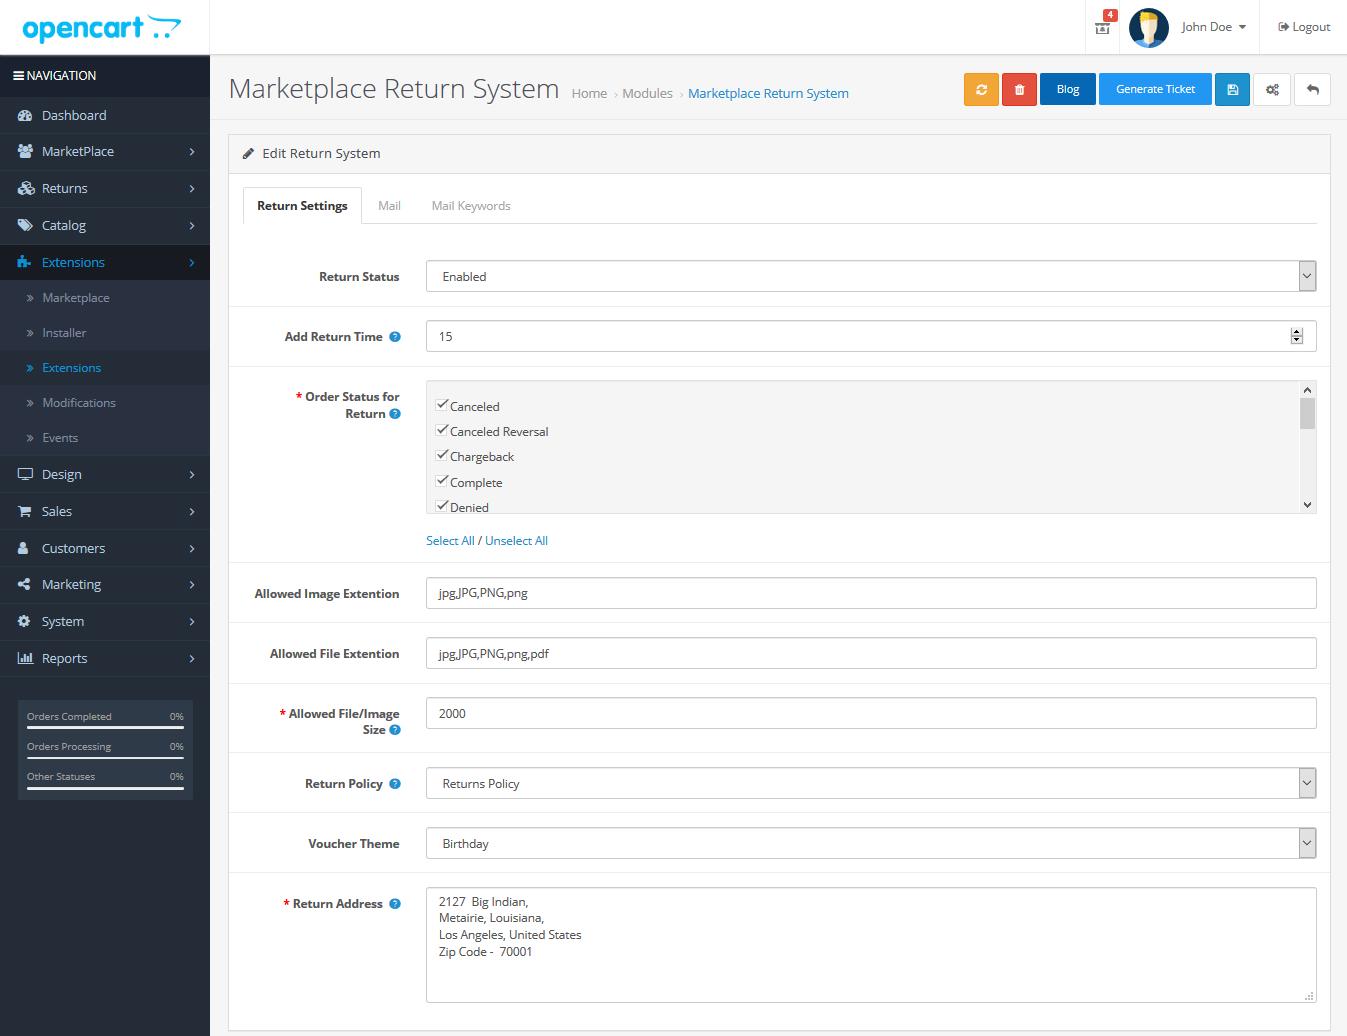 webkul_opencart_marketplace_rma_return_settings_tab_module_configuration-1